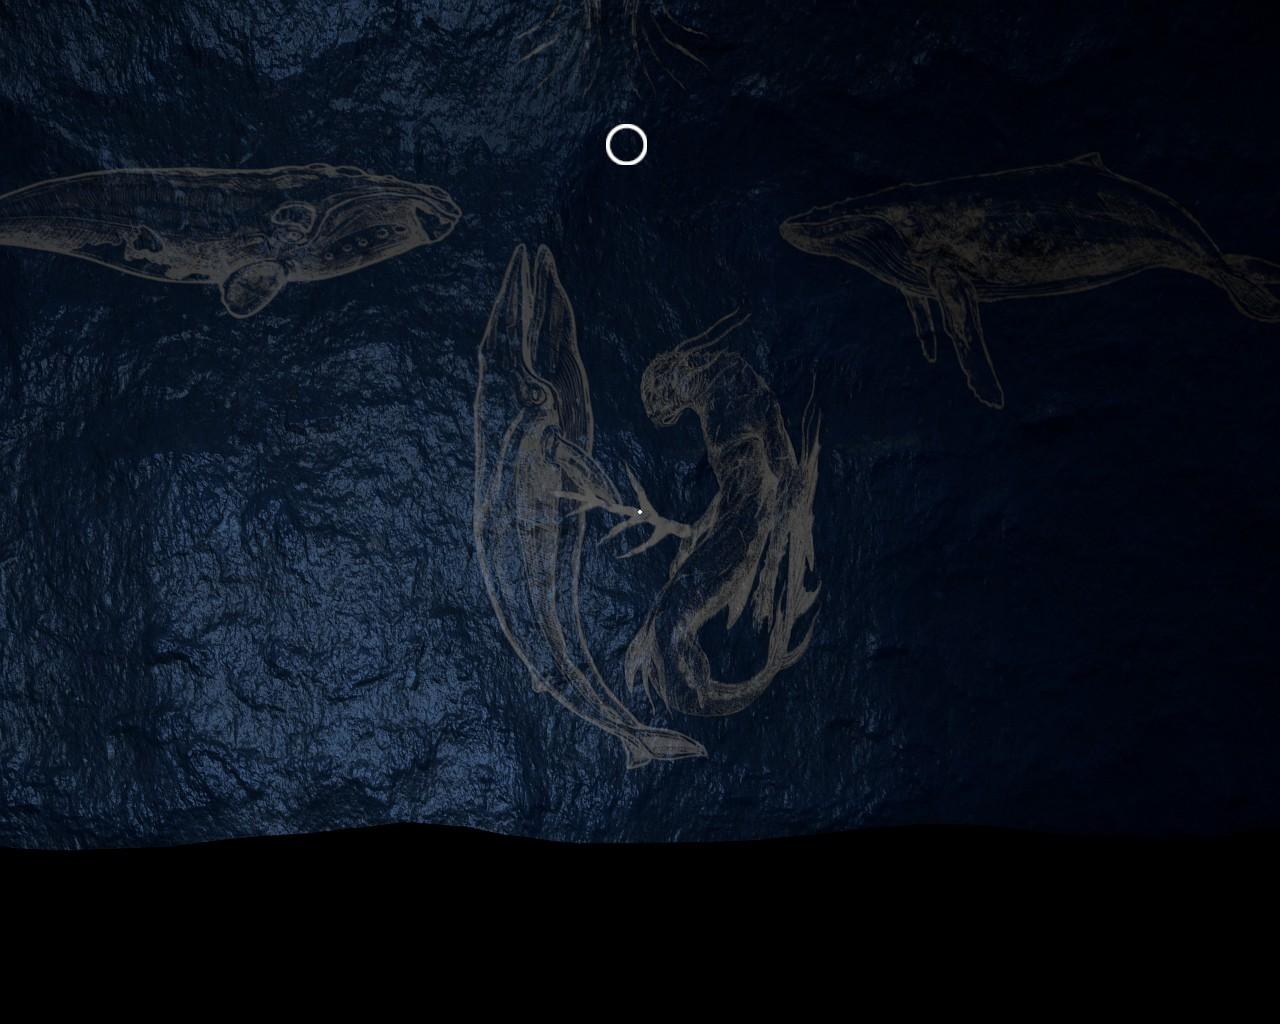 Dagon Achievements Guide ( The Eldritch Biographer ) - Location of secret branches - C7C27F3